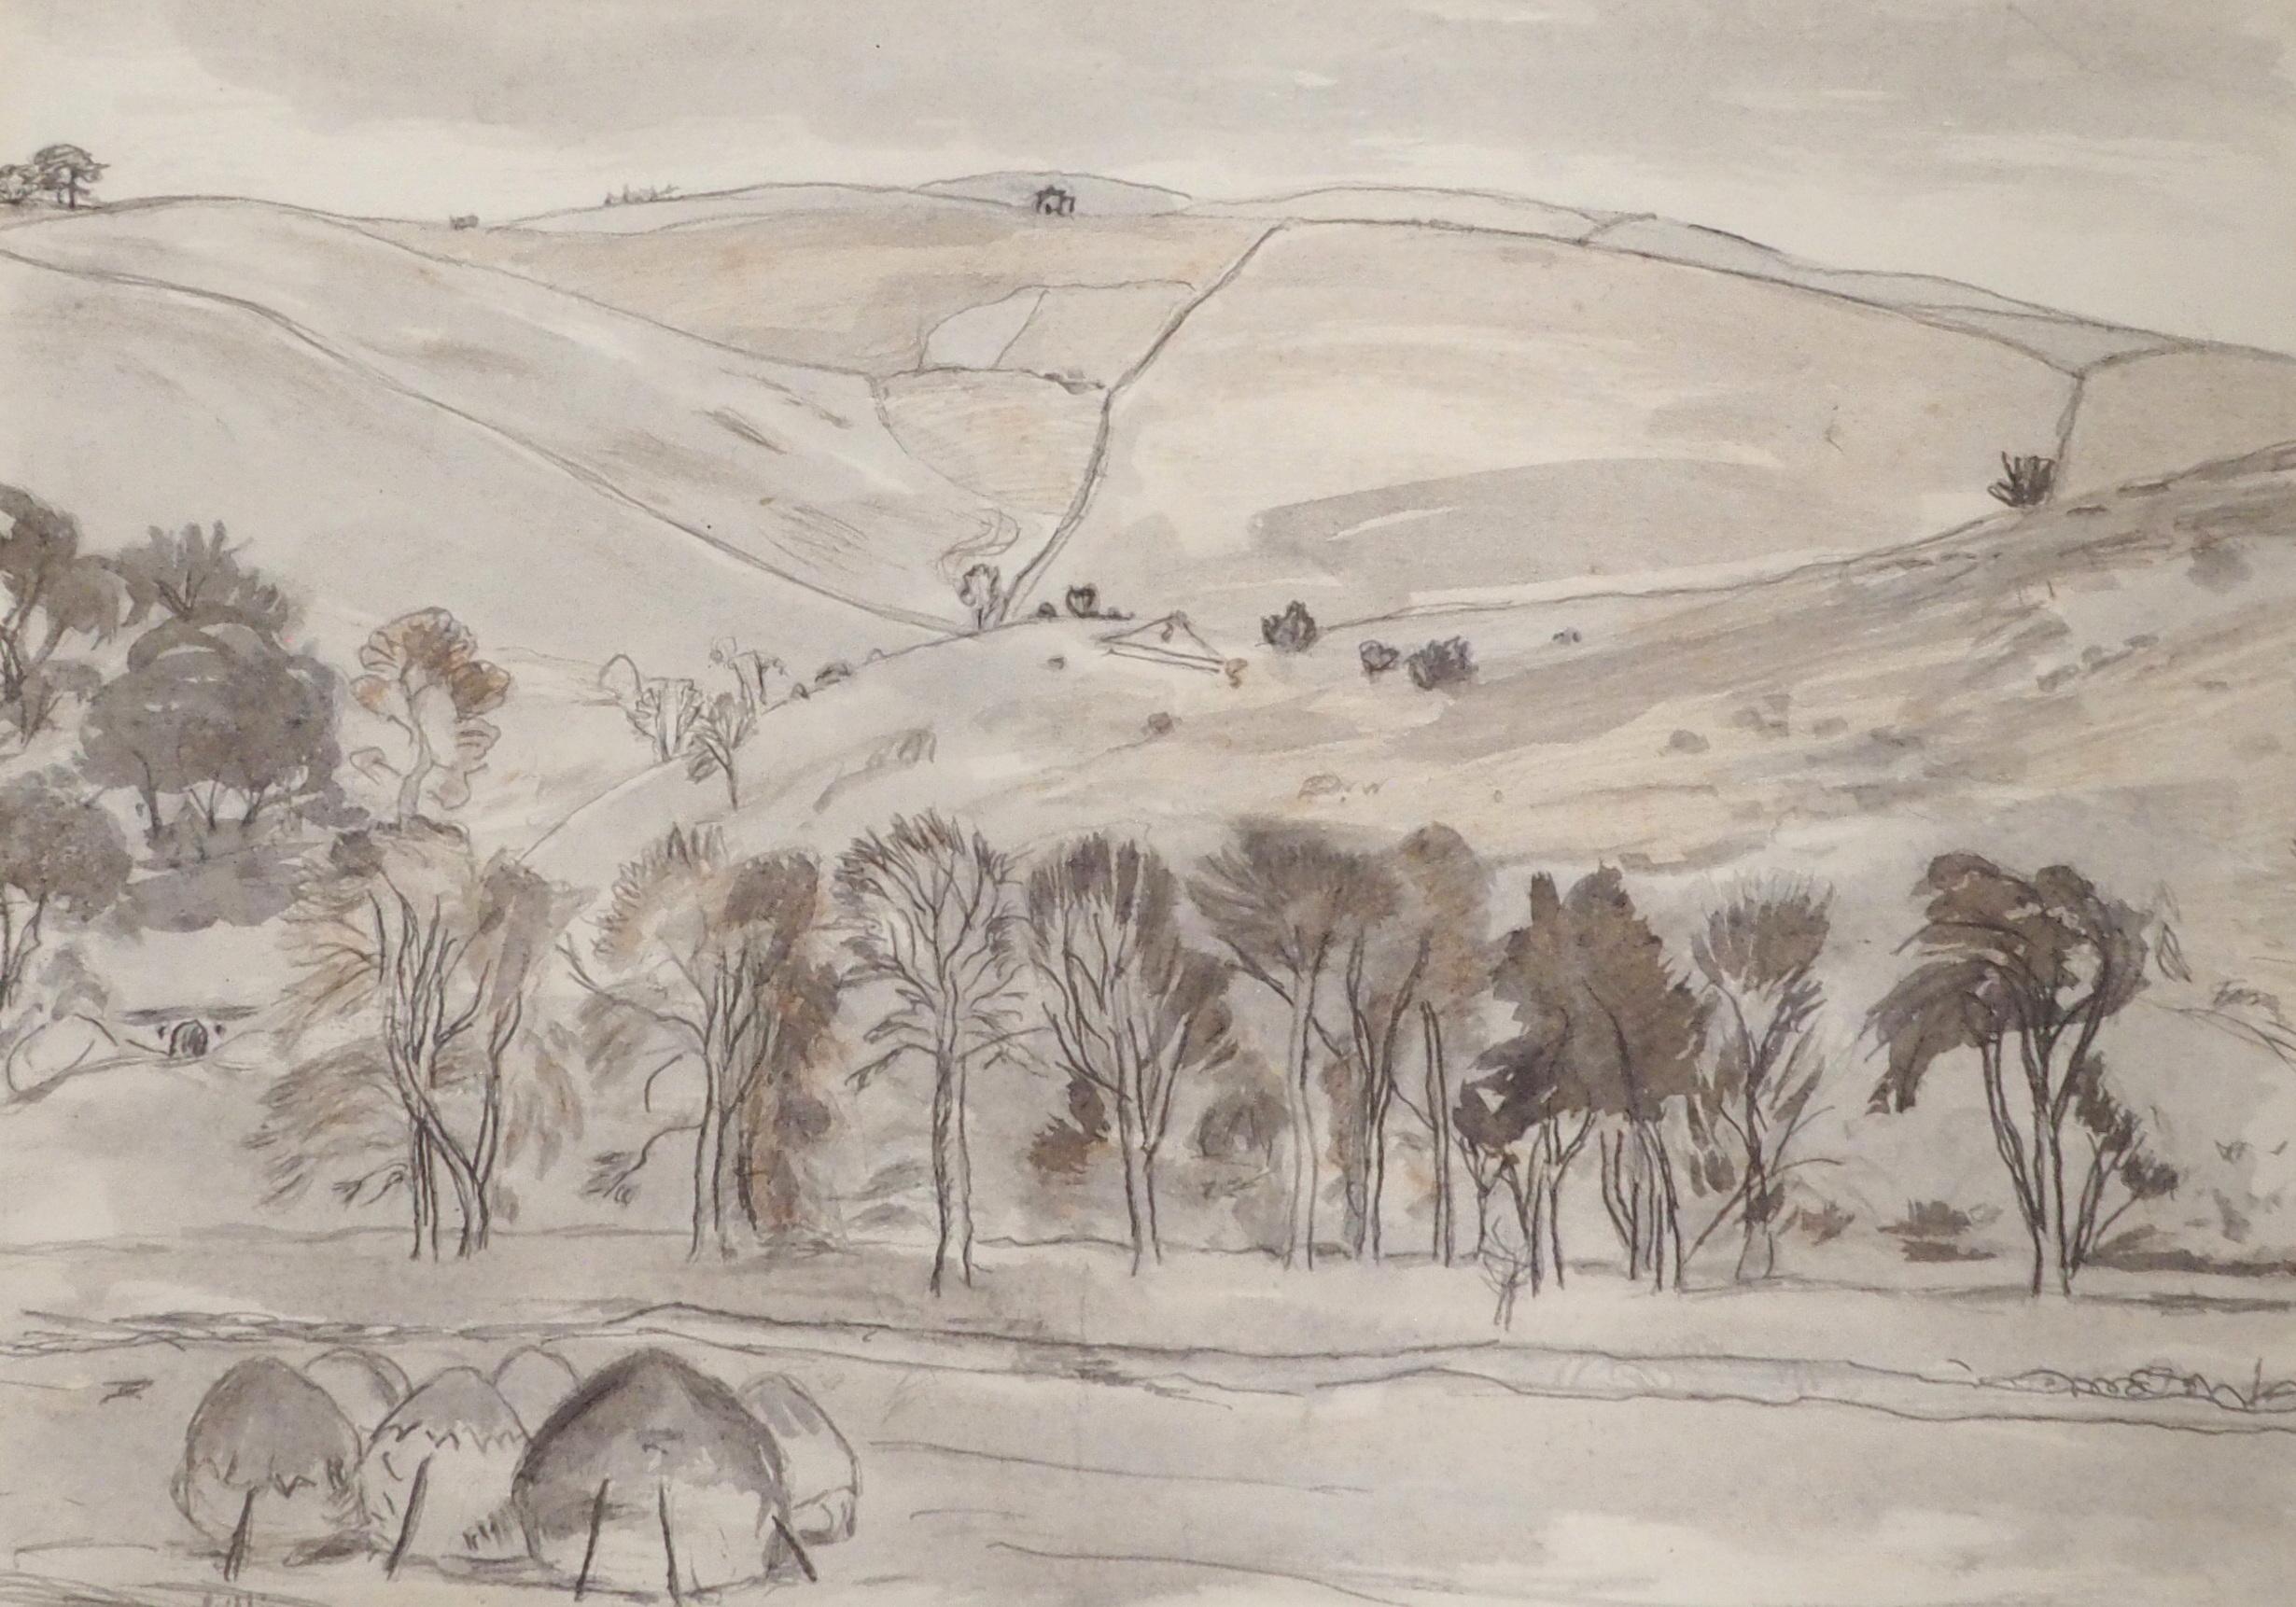 •SIR WILLIAM GEORGE GILLIES CBE, LLD, RA, RSA, PRSW (SCOTTISH 1898-1973) ABOVE LYNE VALLEY Pencil